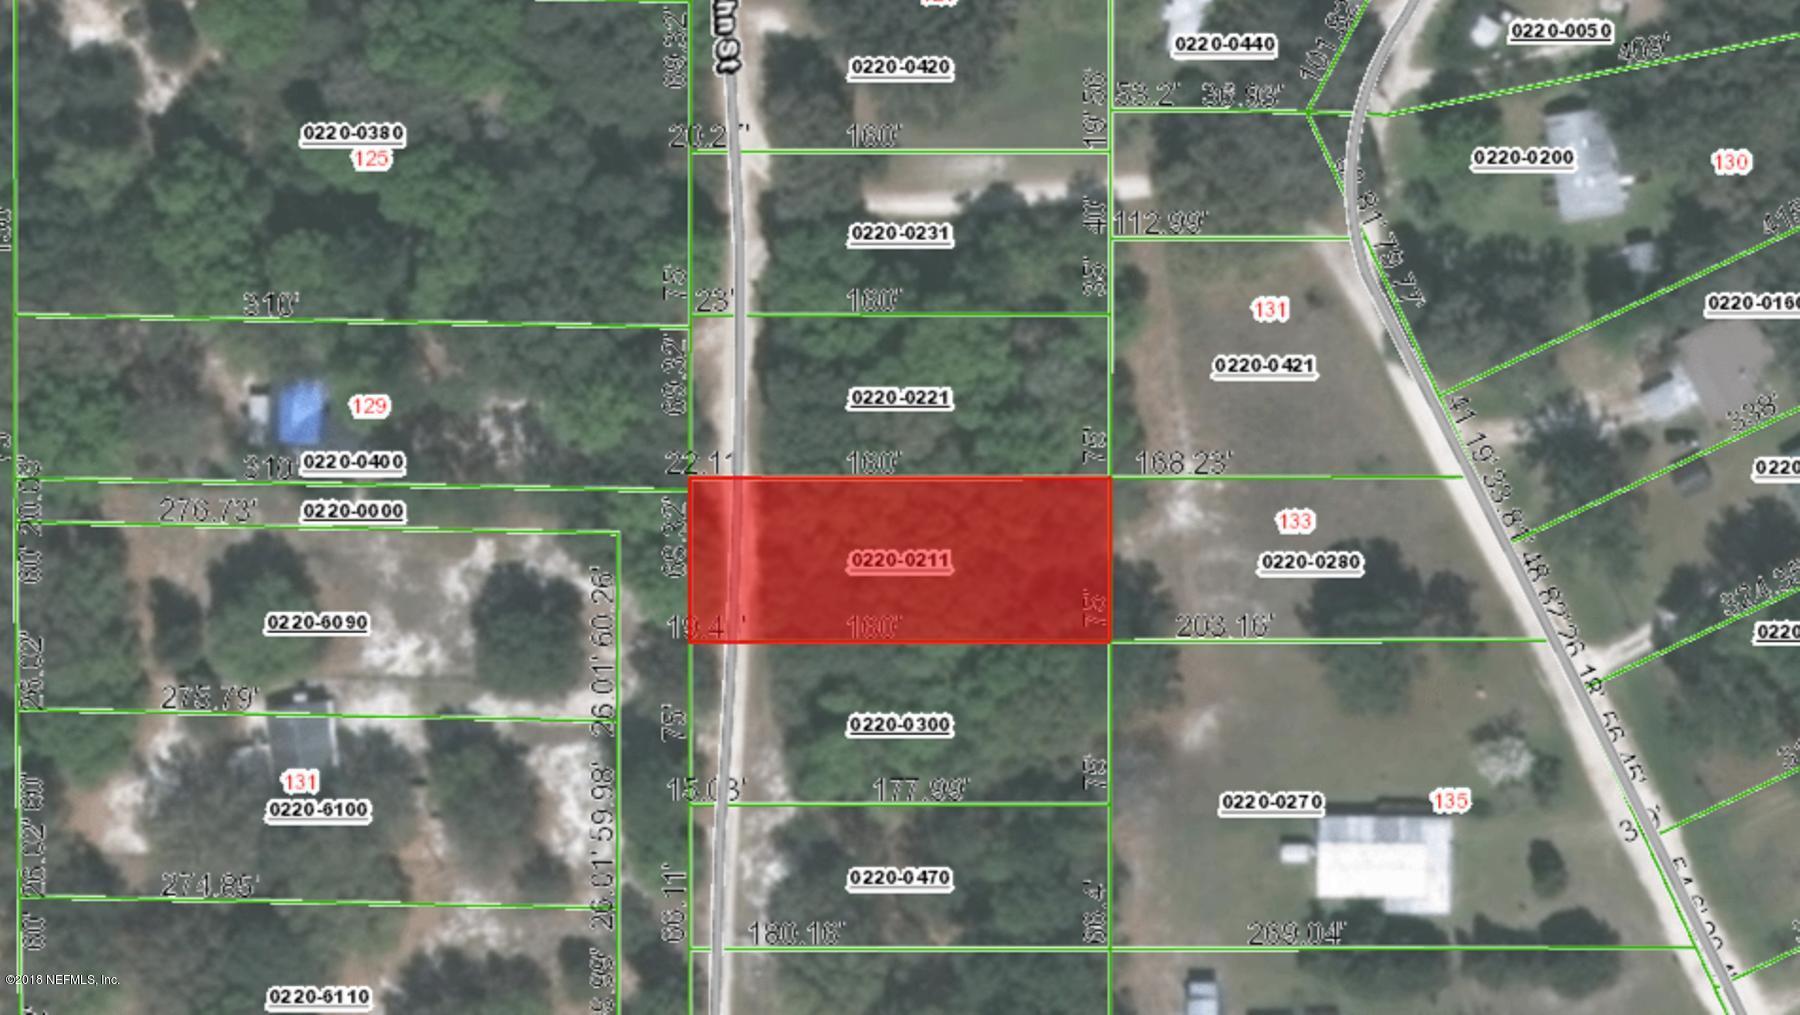 000 JOHN, HAWTHORNE, FLORIDA 32640, ,Vacant land,For sale,JOHN,936576